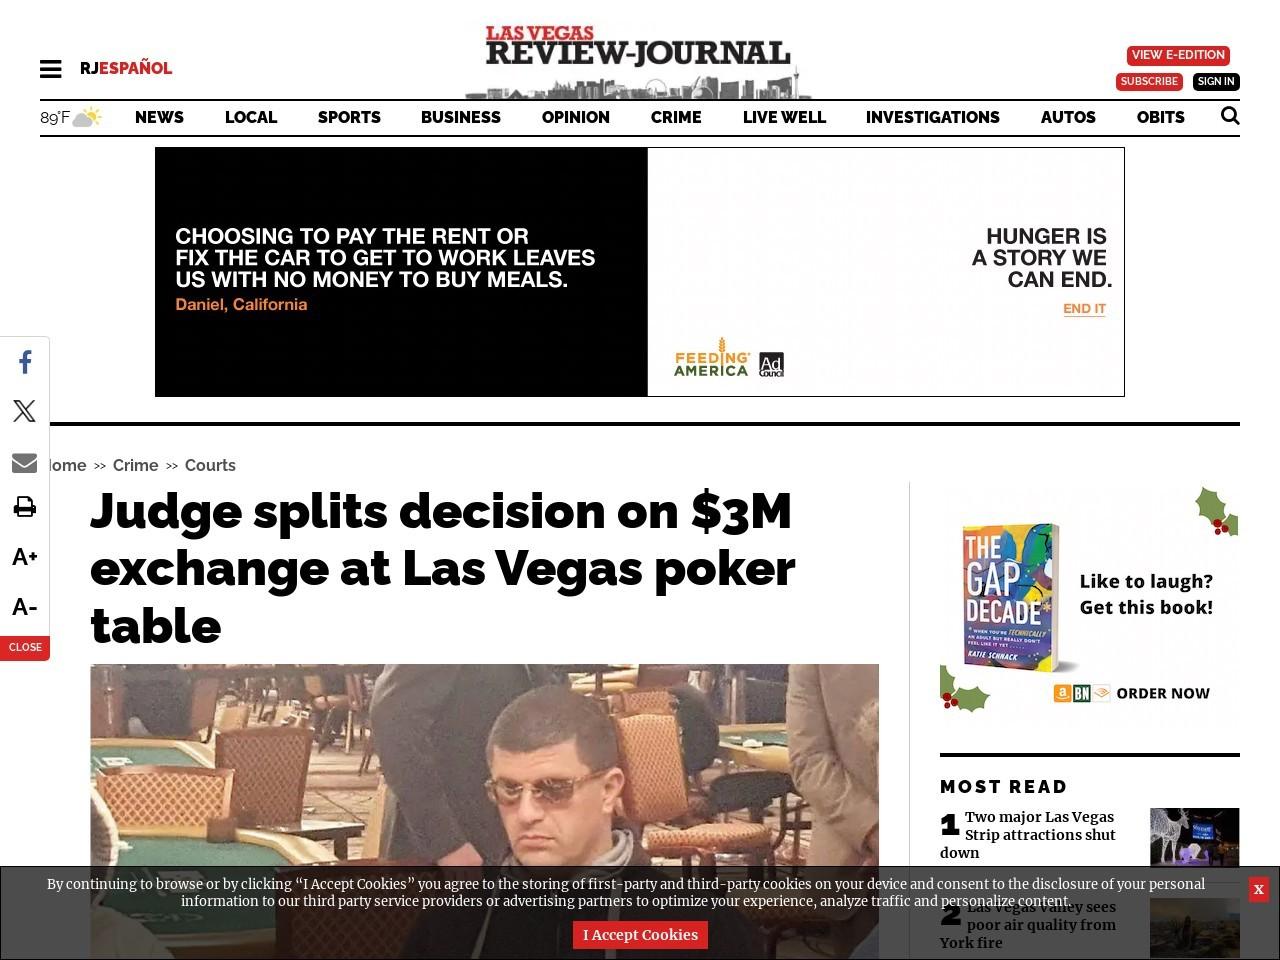 Judge splits decision on $3M exchange at Las Vegas poker table